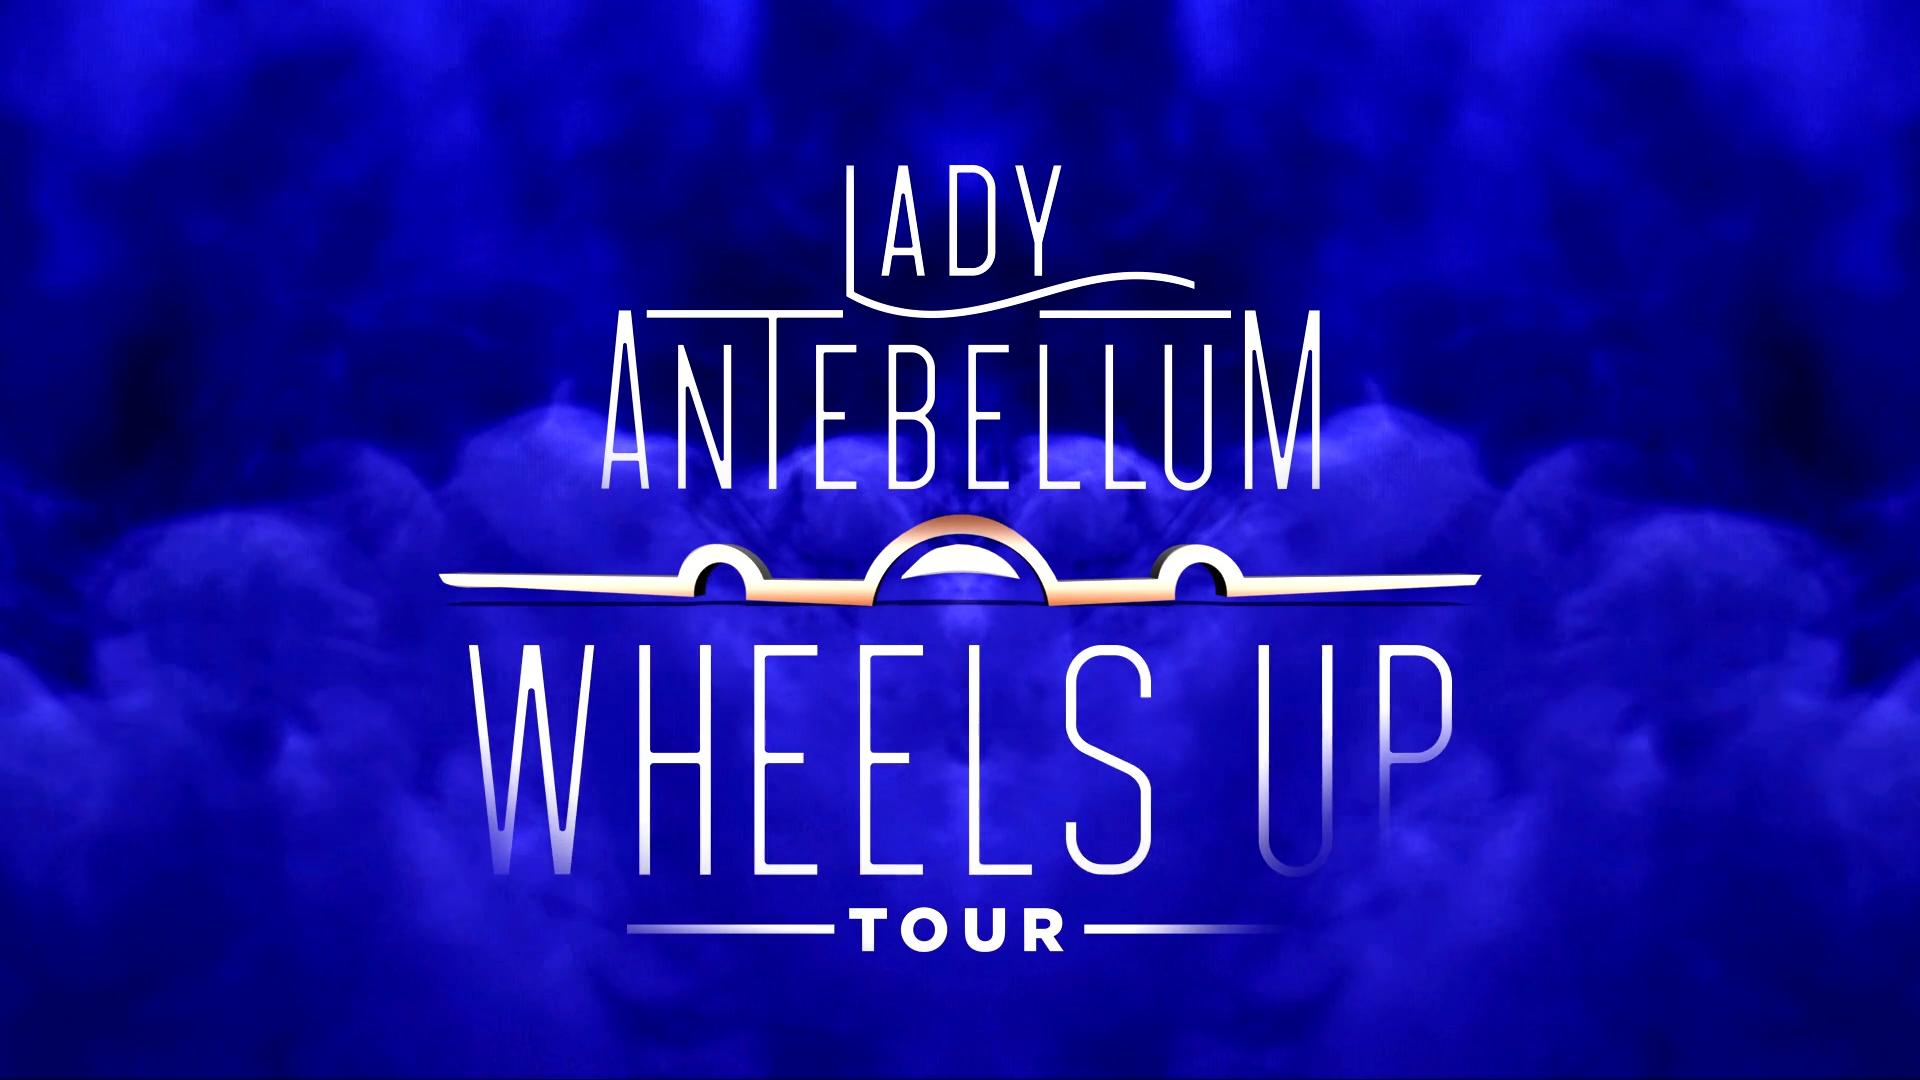 Lady Antebellum - Wheels Up Tour.2015.BDRip1080p.mkv_snapshot_00.01.11_[2015.12.10_08.54.23].png